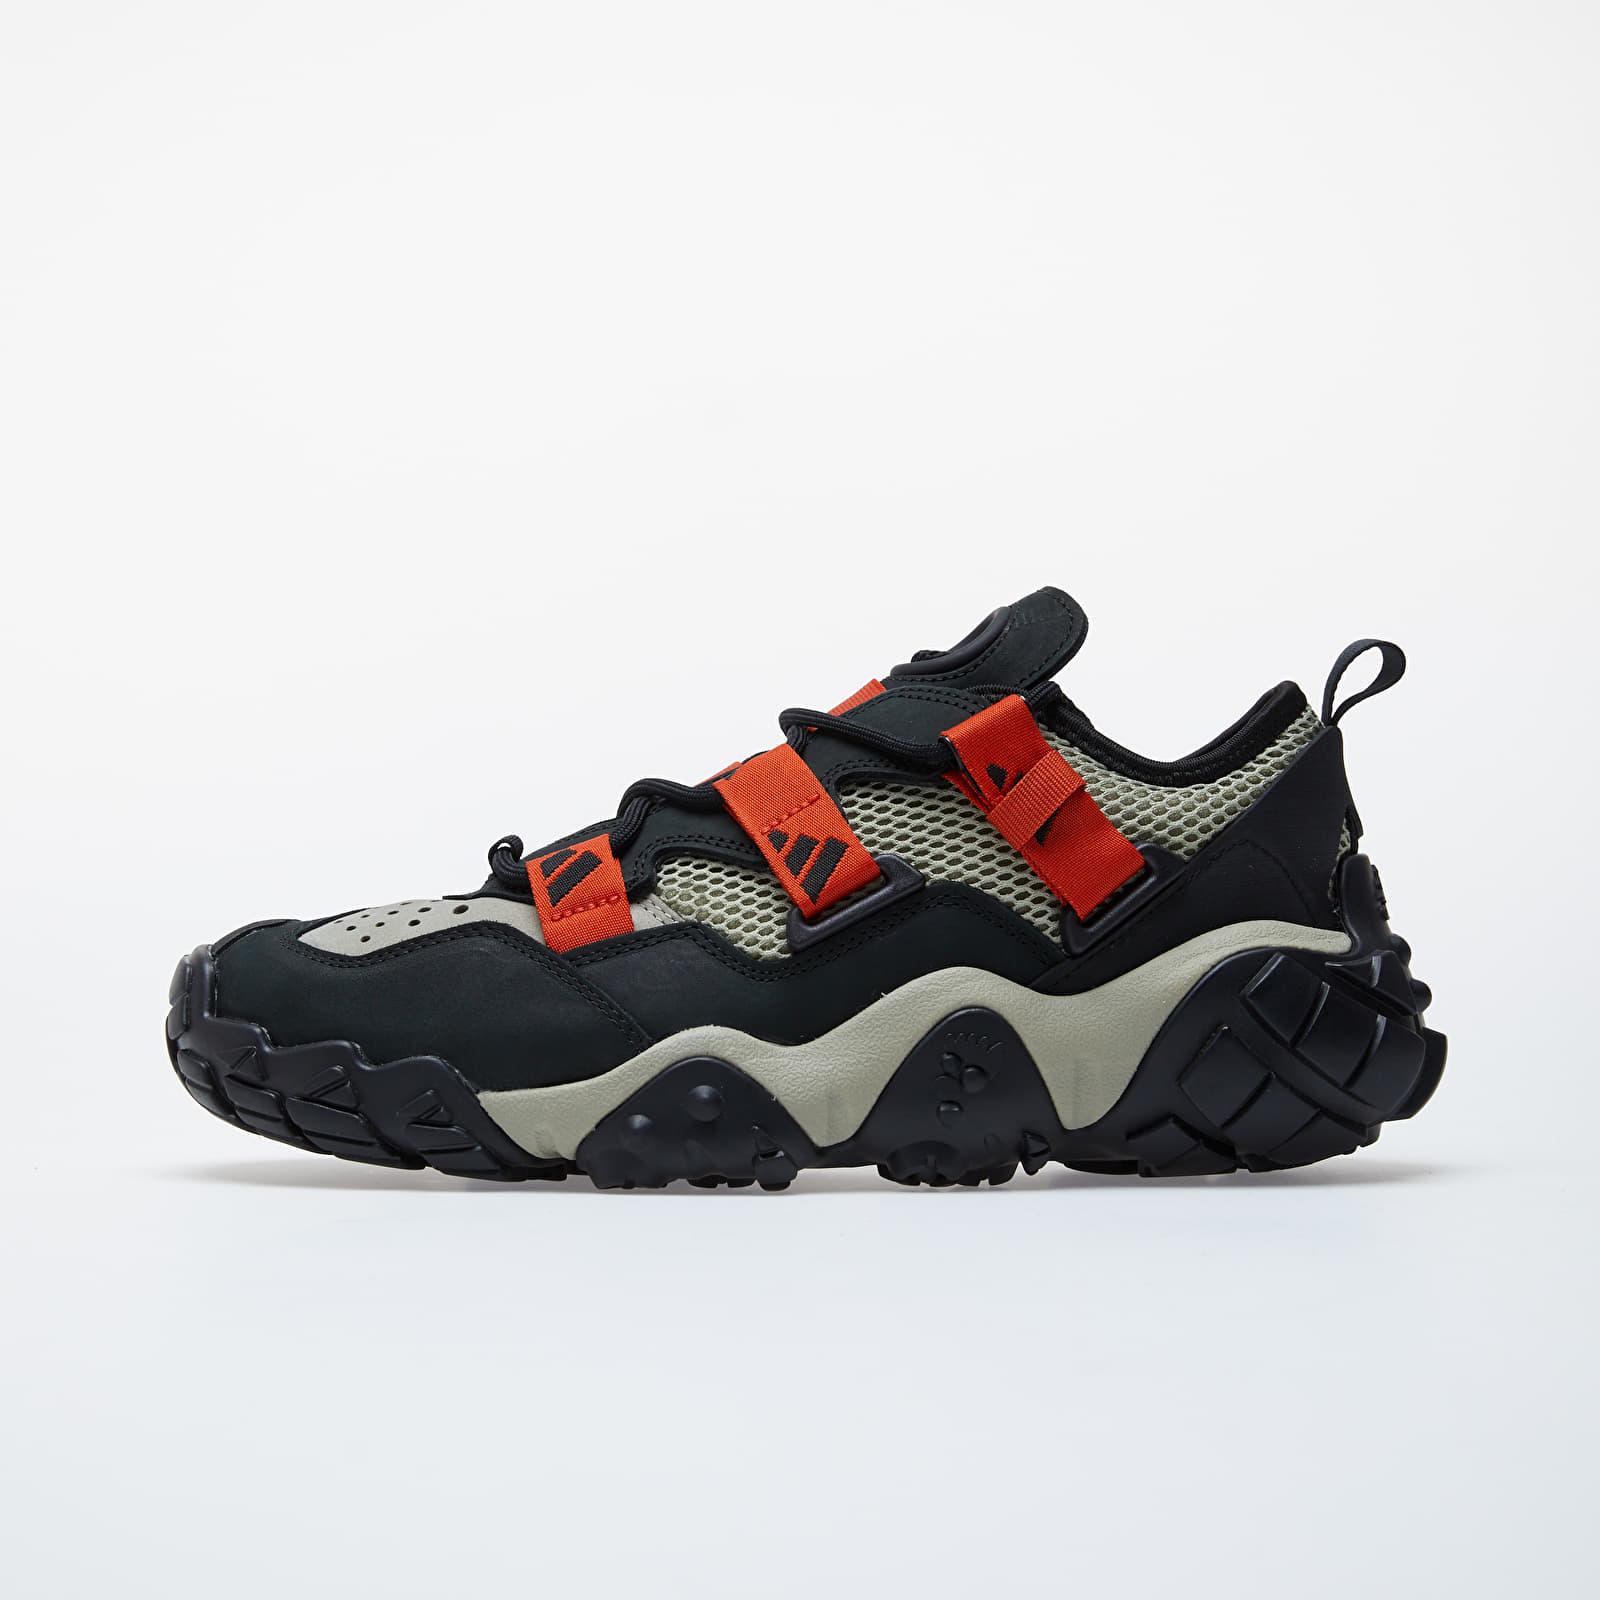 Men's shoes adidas FYW XTA Supplier Colour/ Craft Chili/ Core Black